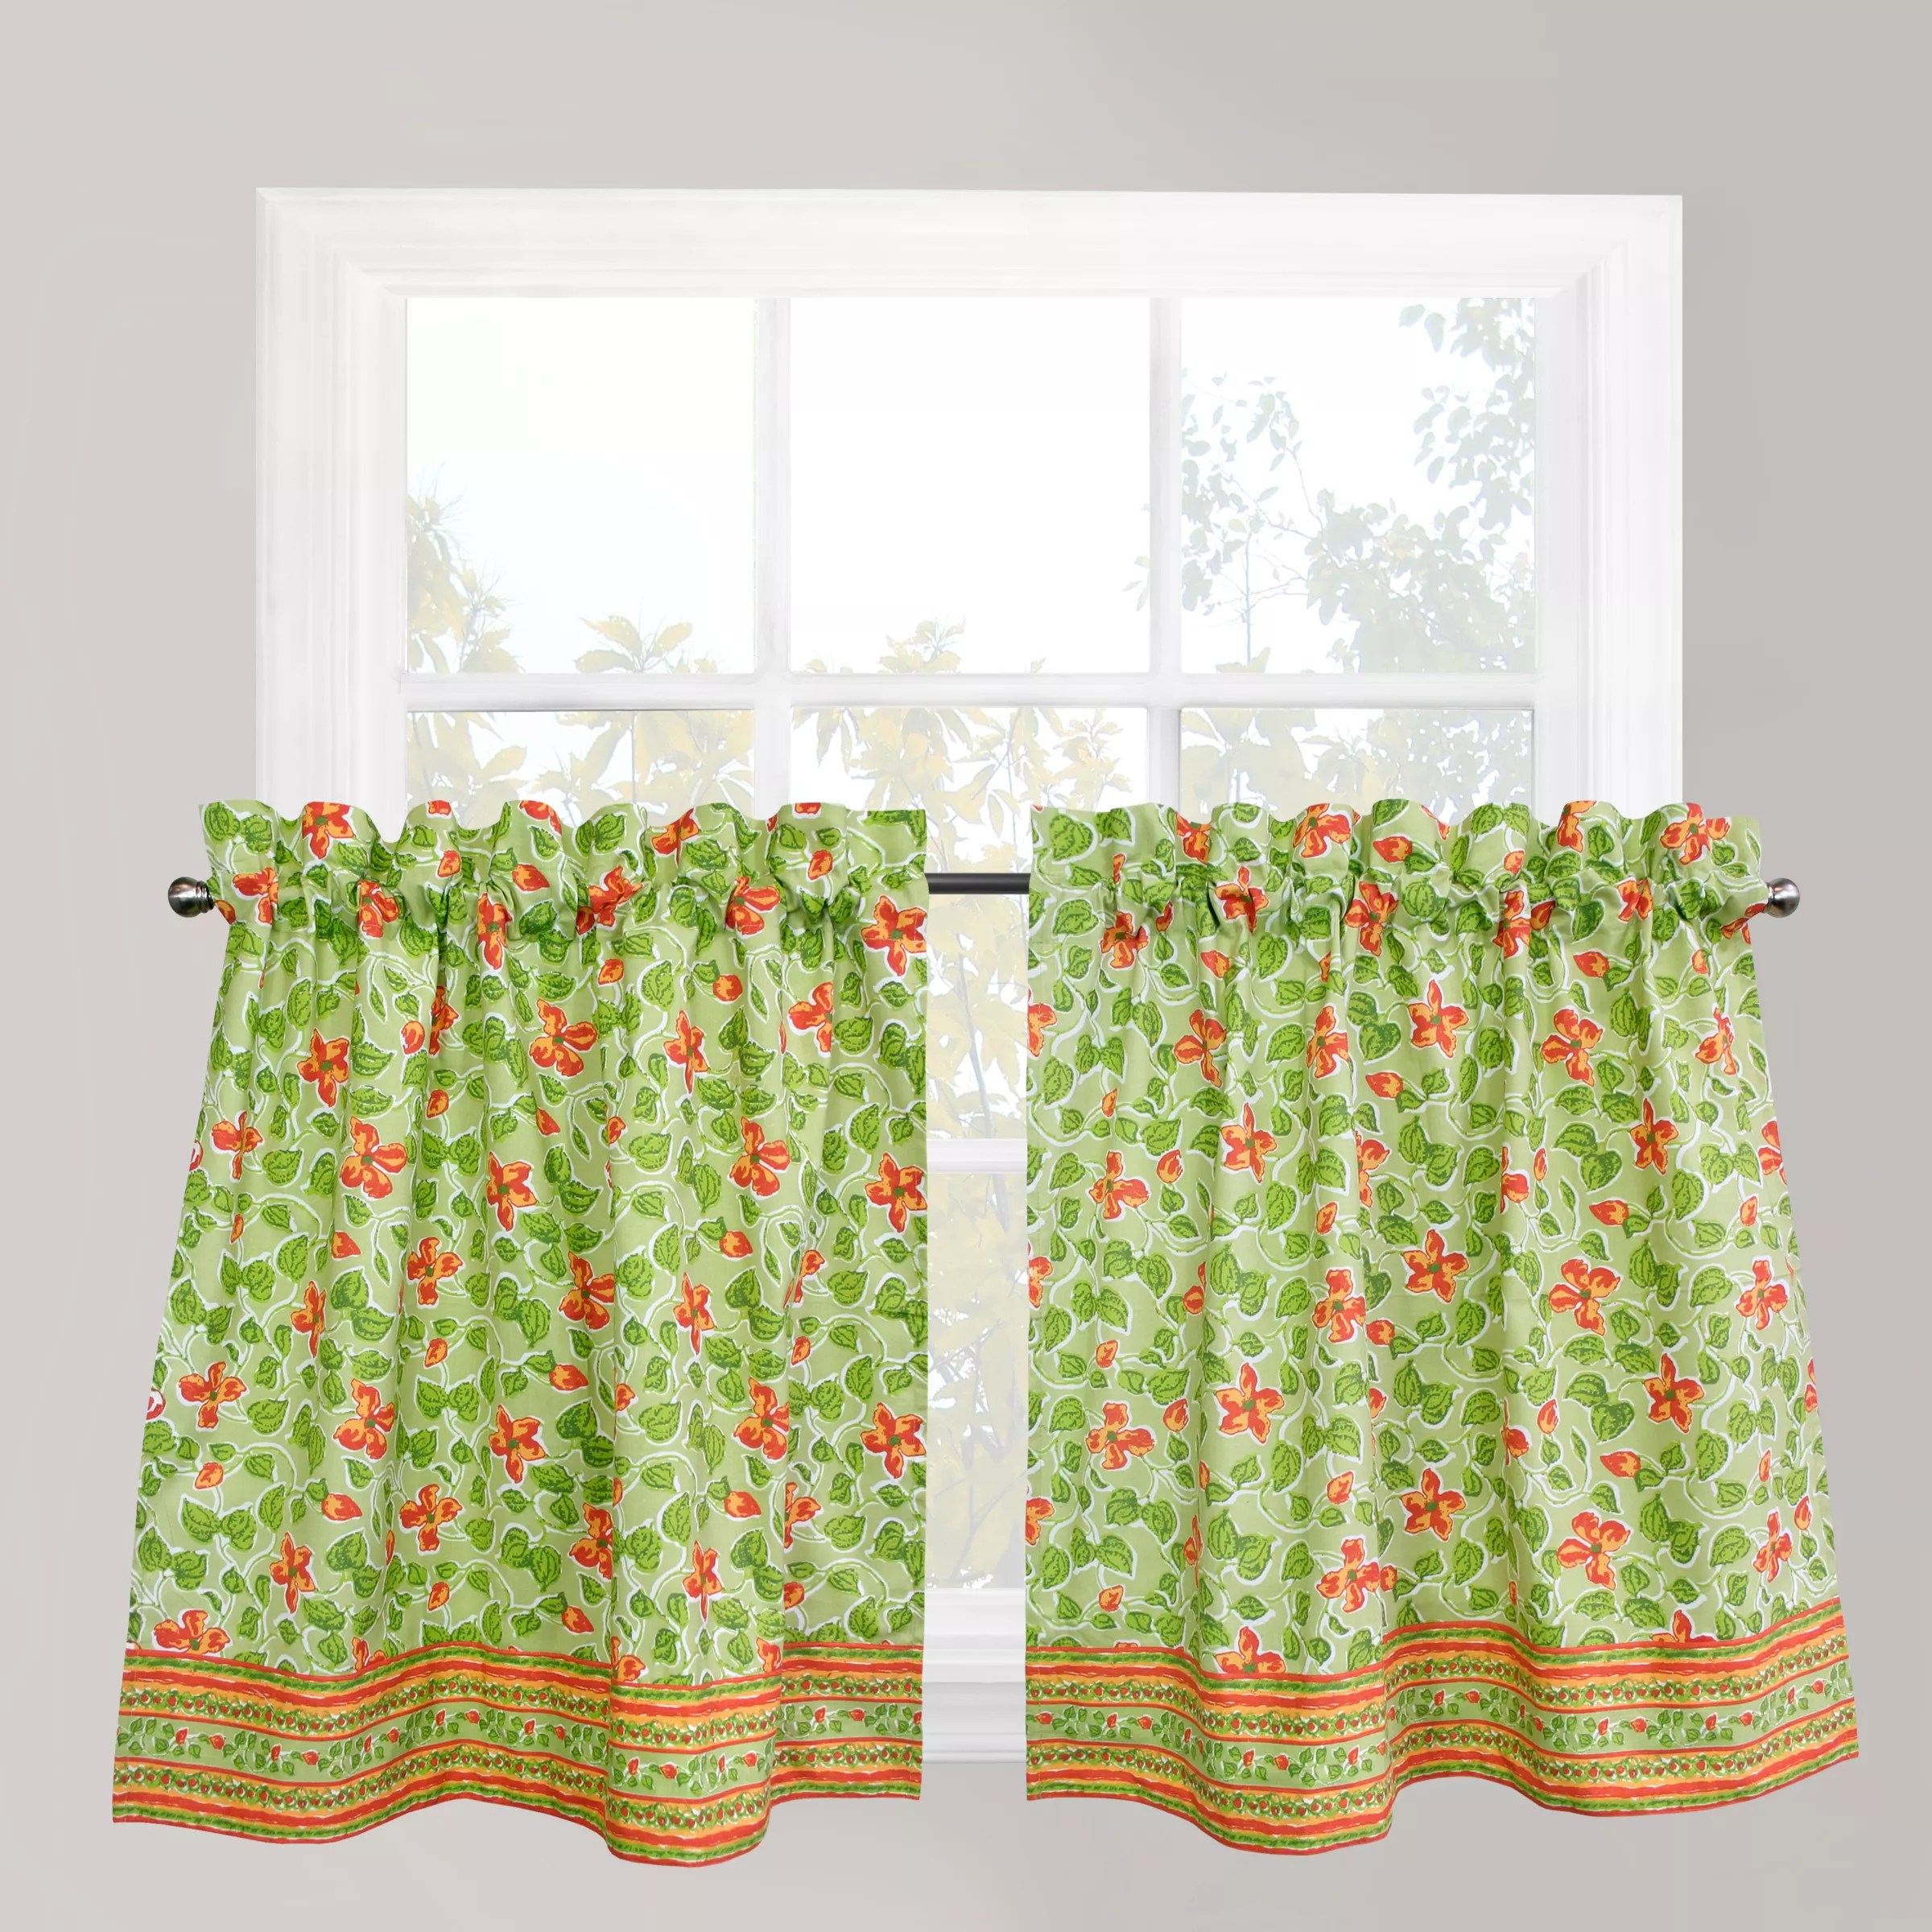 Park B Smith Boutique Flowers Tier Kitchen Window Curtain Set